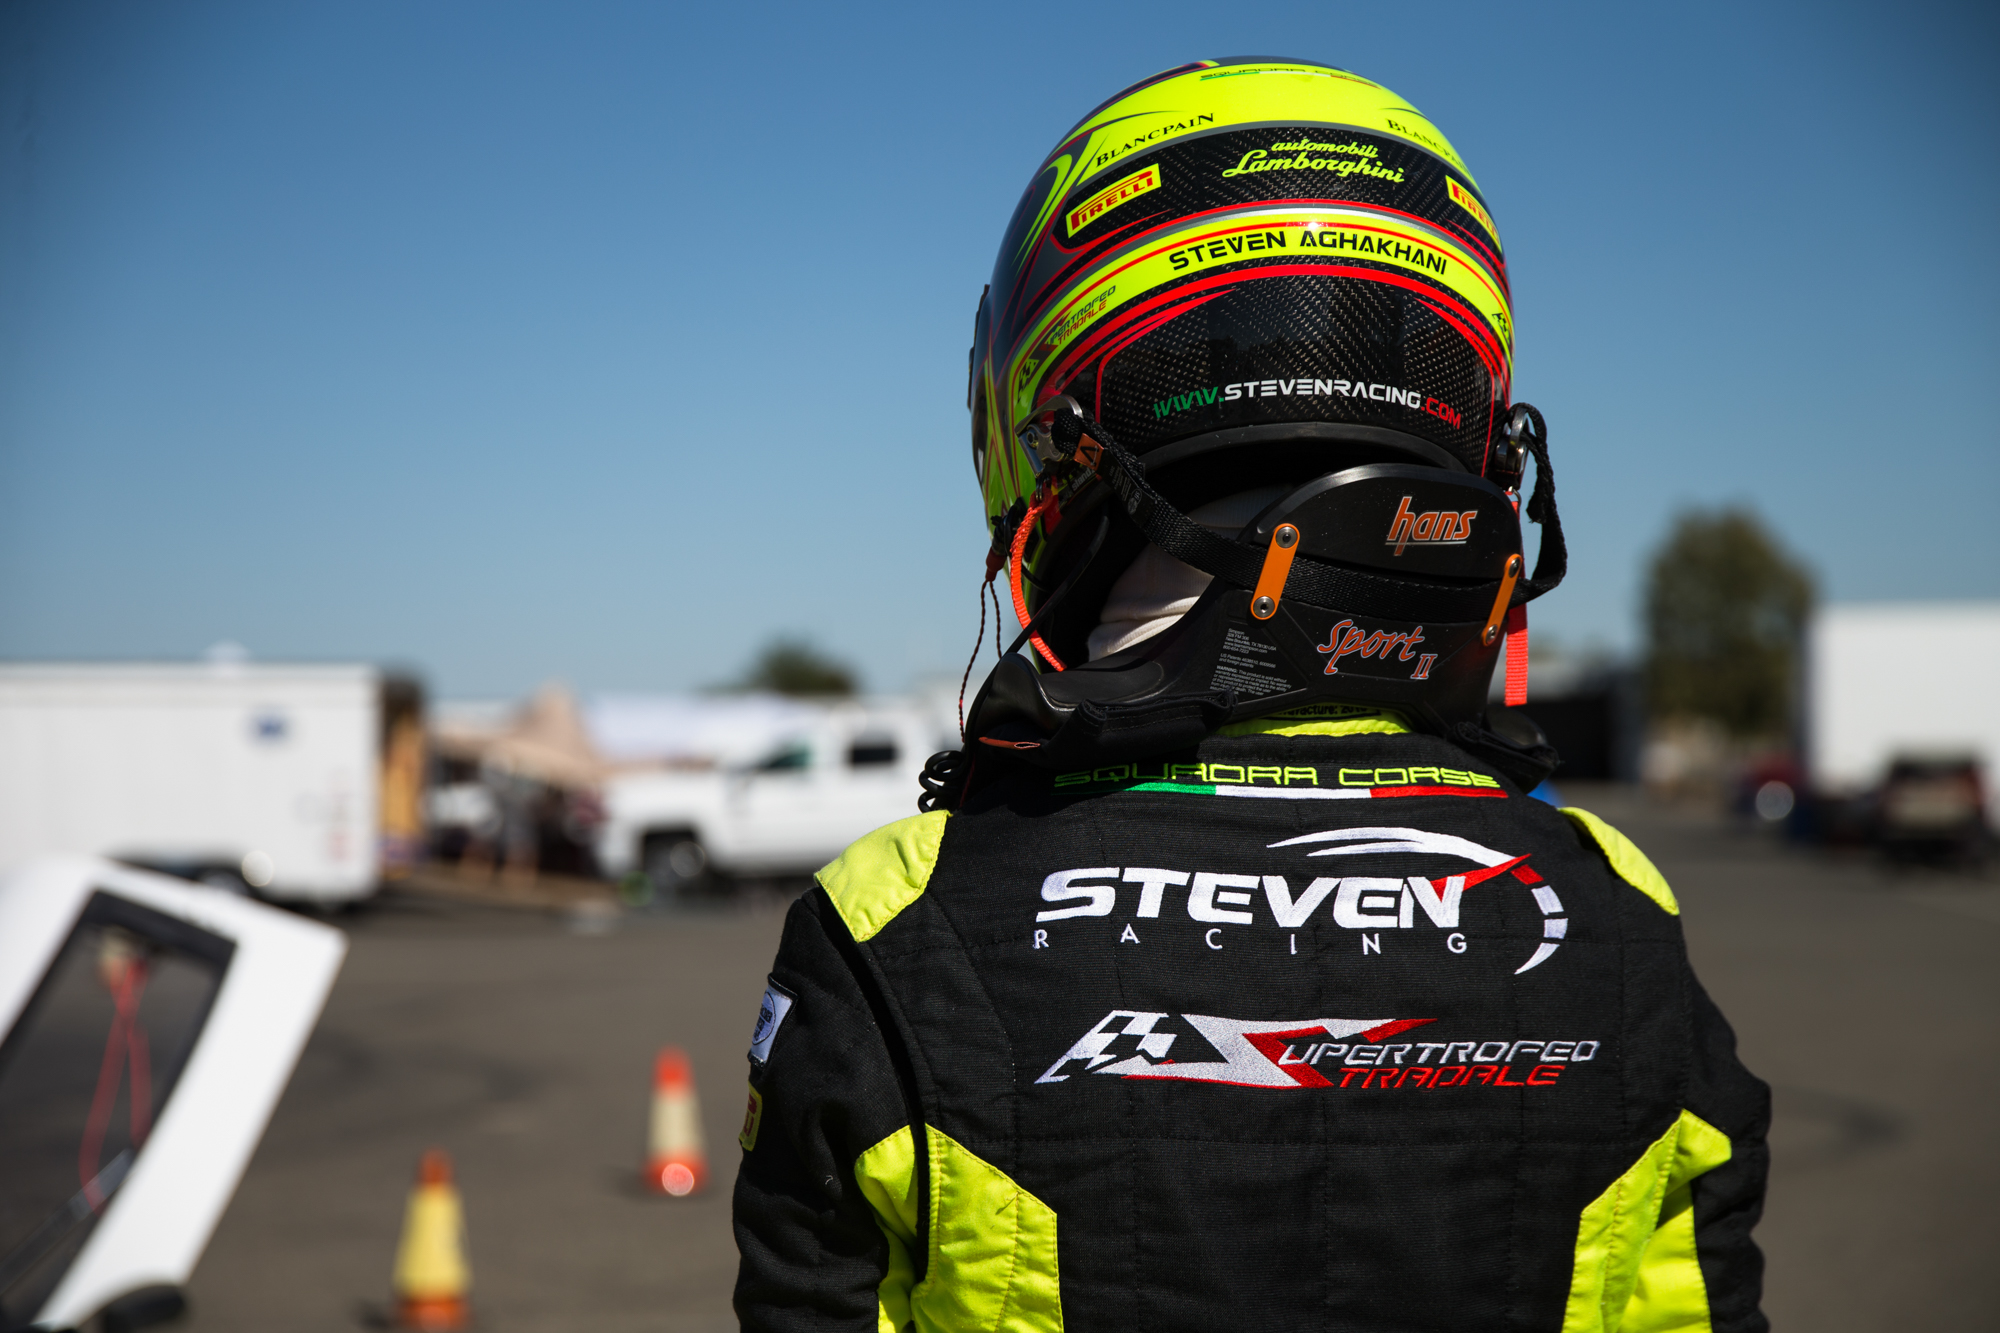 Steven-Racing-20171006-44966.jpg